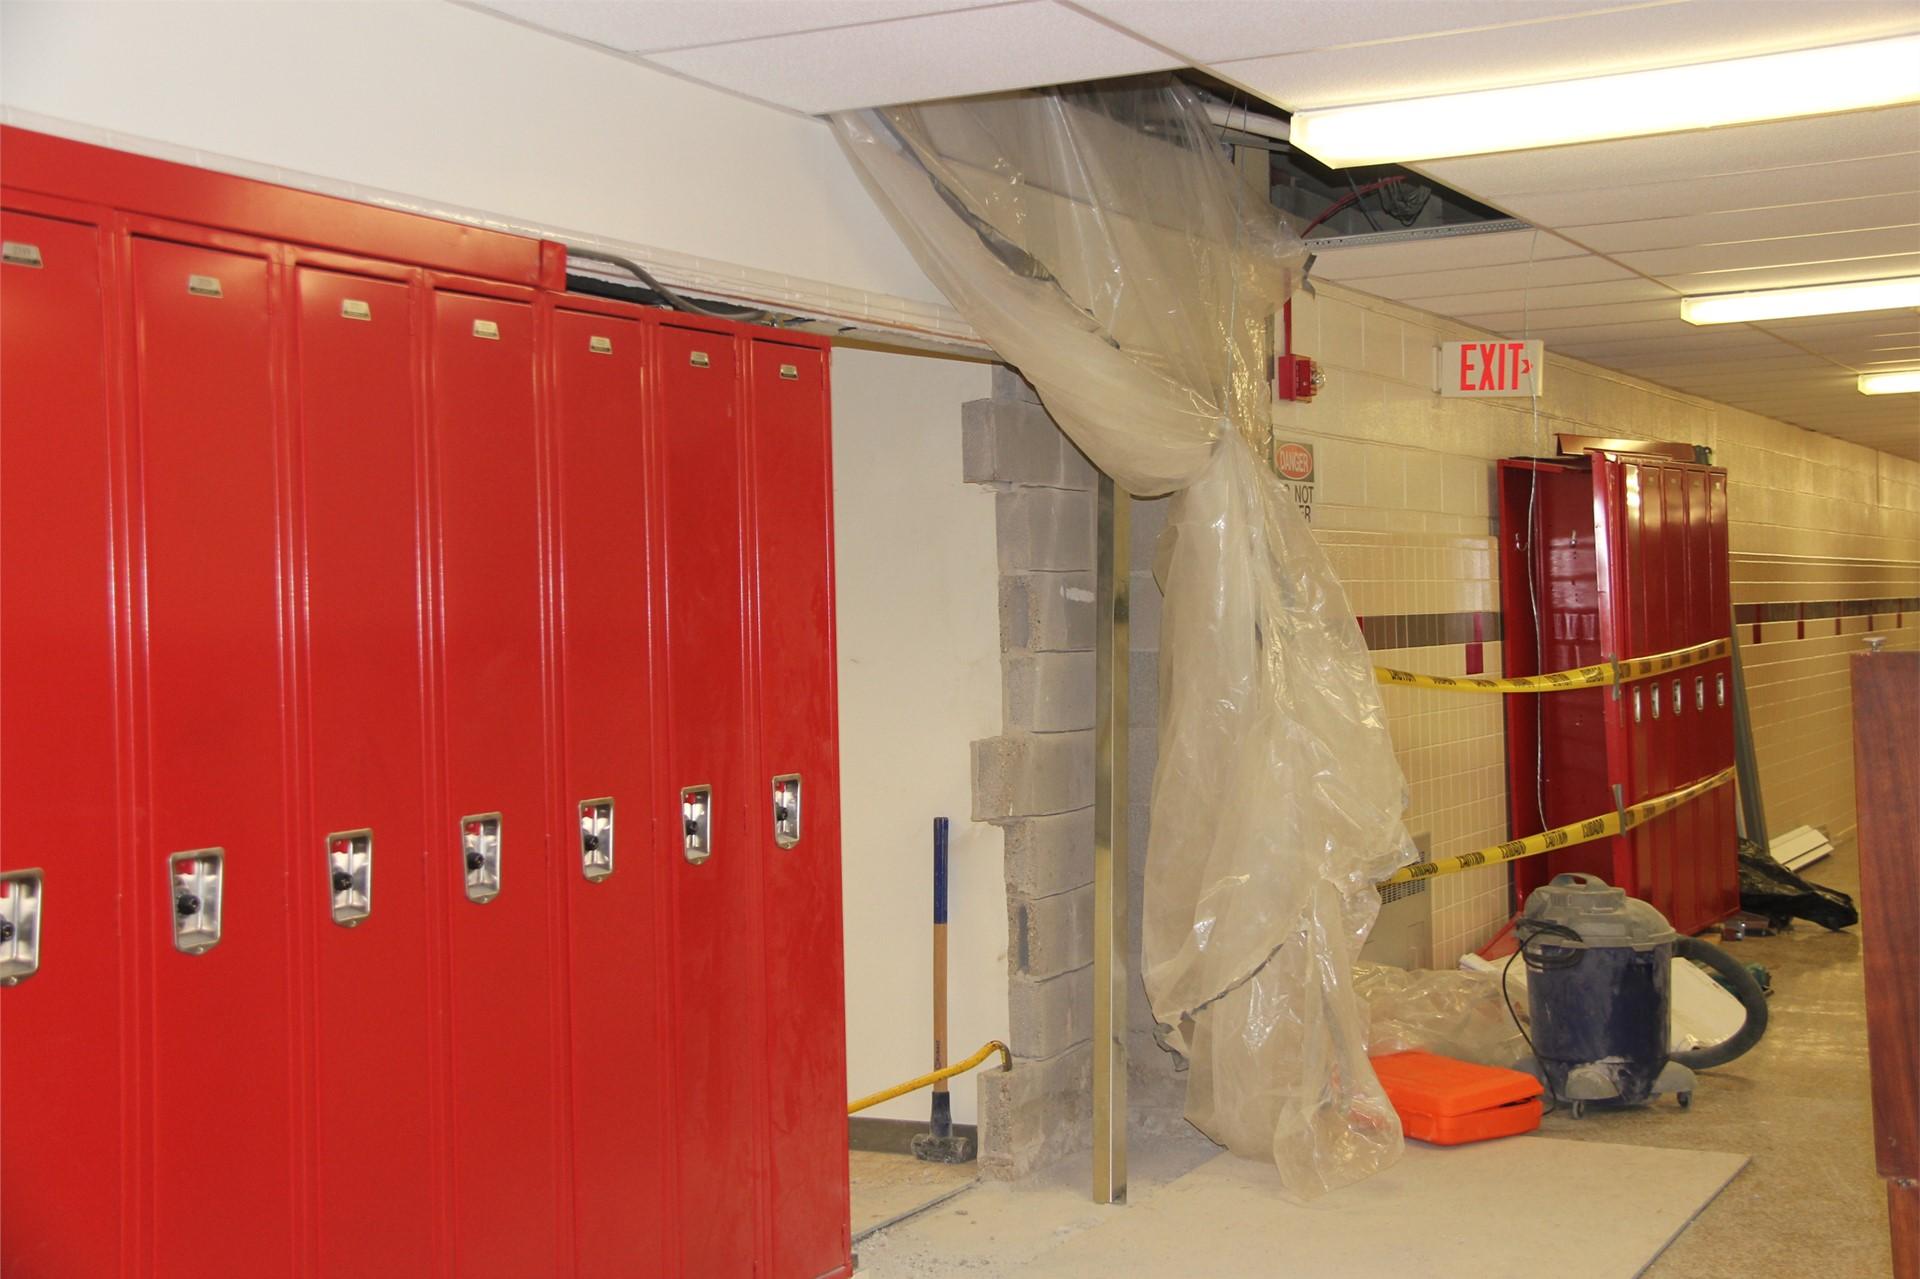 construction in hallway